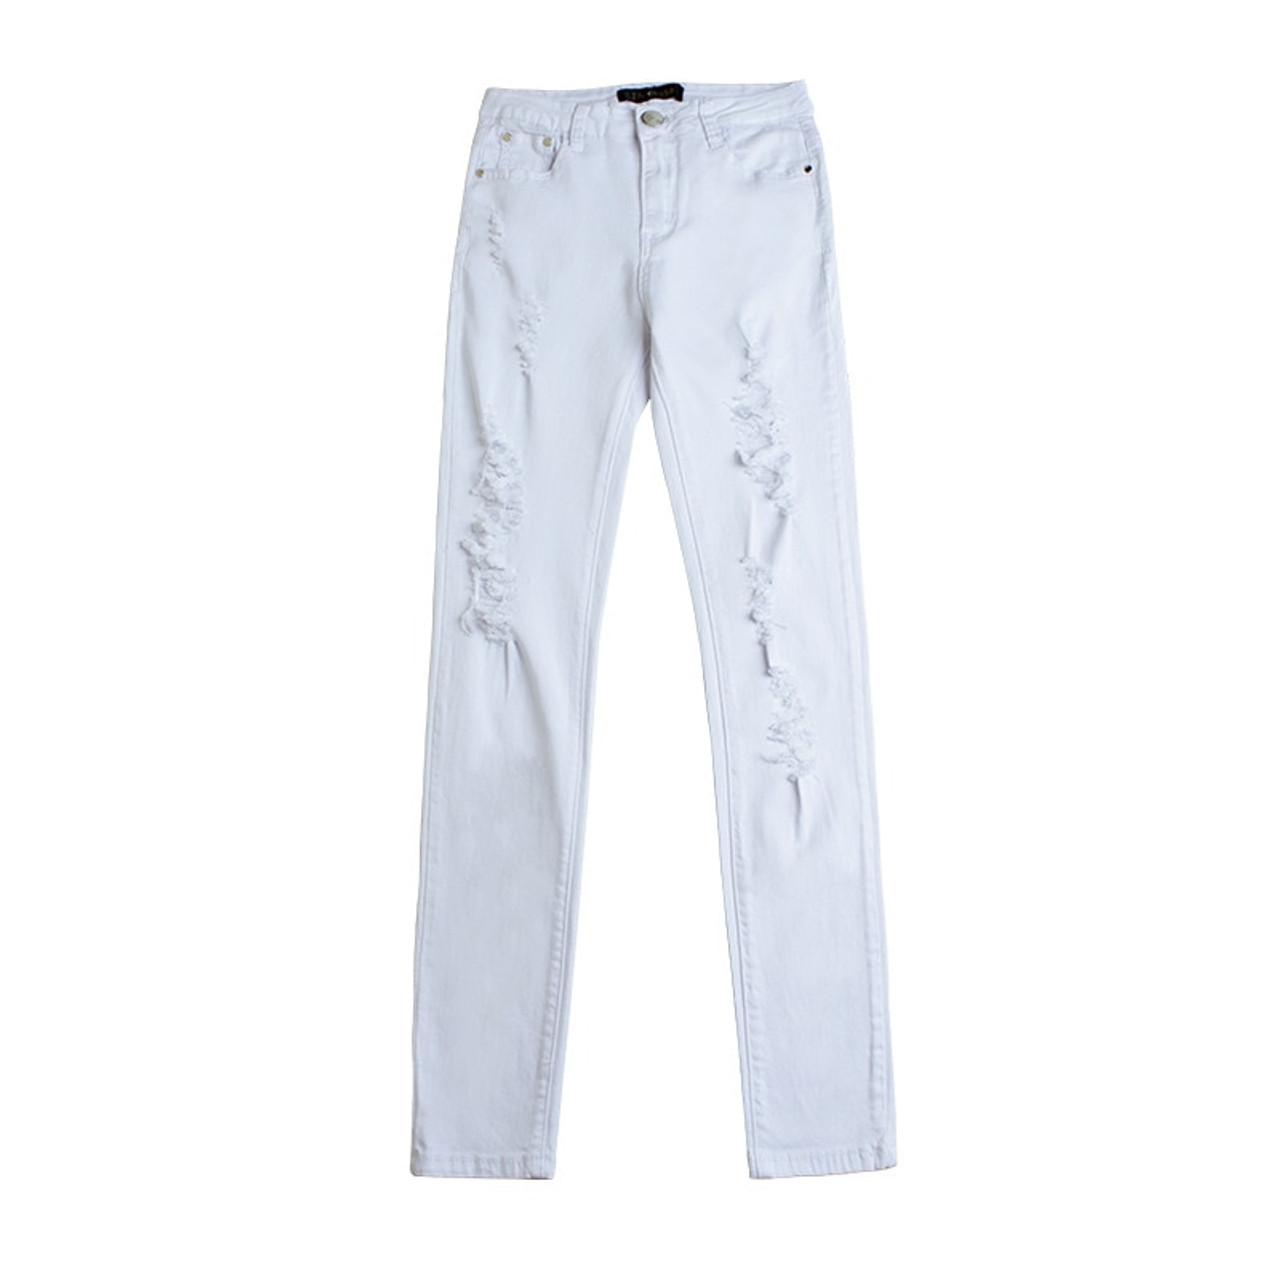 67090b41f7c86b ... Summer Style White Hole Ripped Jeans Women Jeggings Cool Denim High  Waist Pants Capris Female Skinny ...